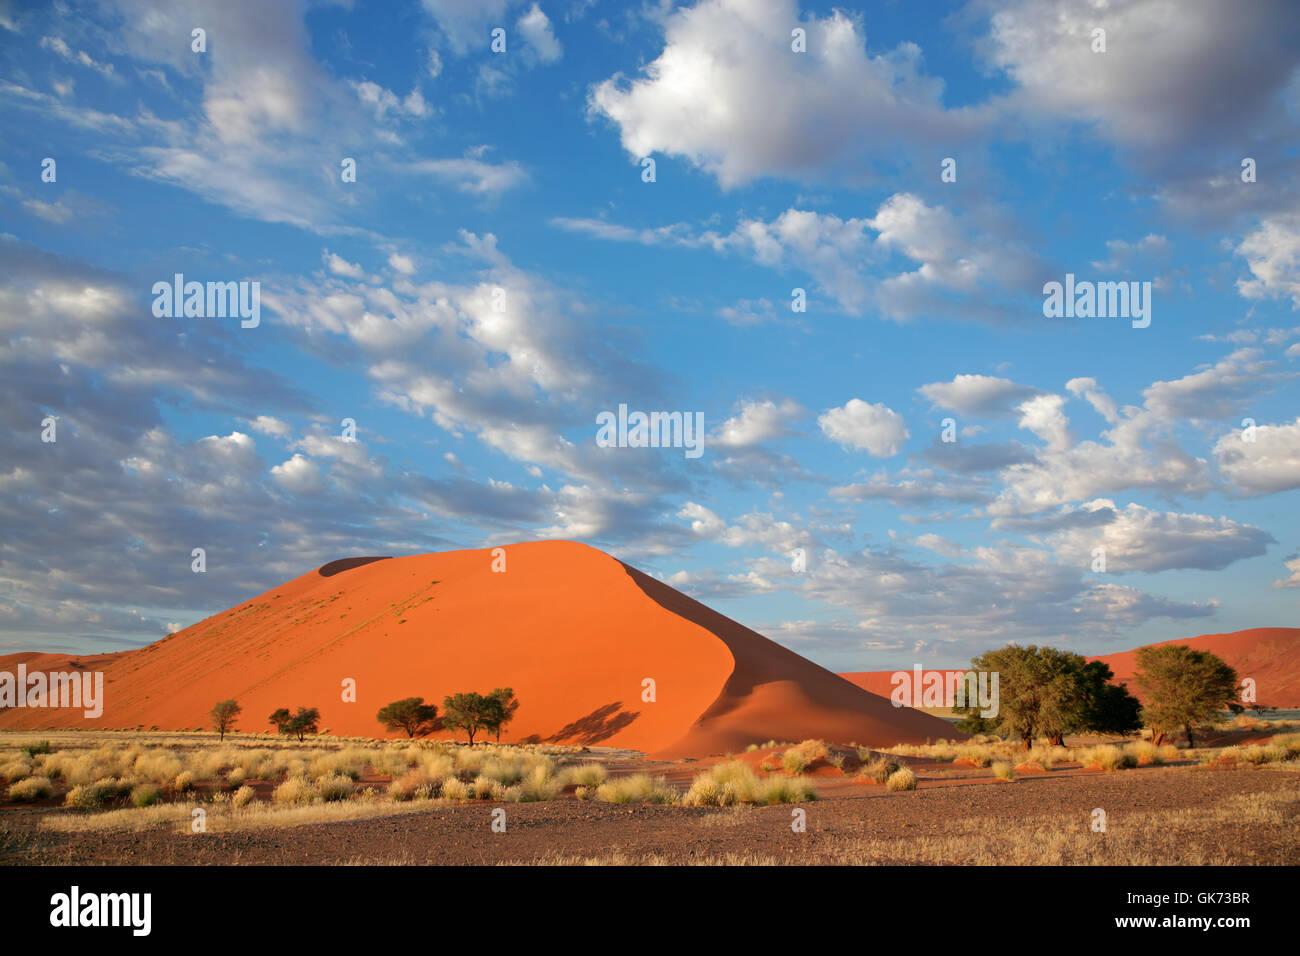 Vasto Deserto della Namibia Foto Stock